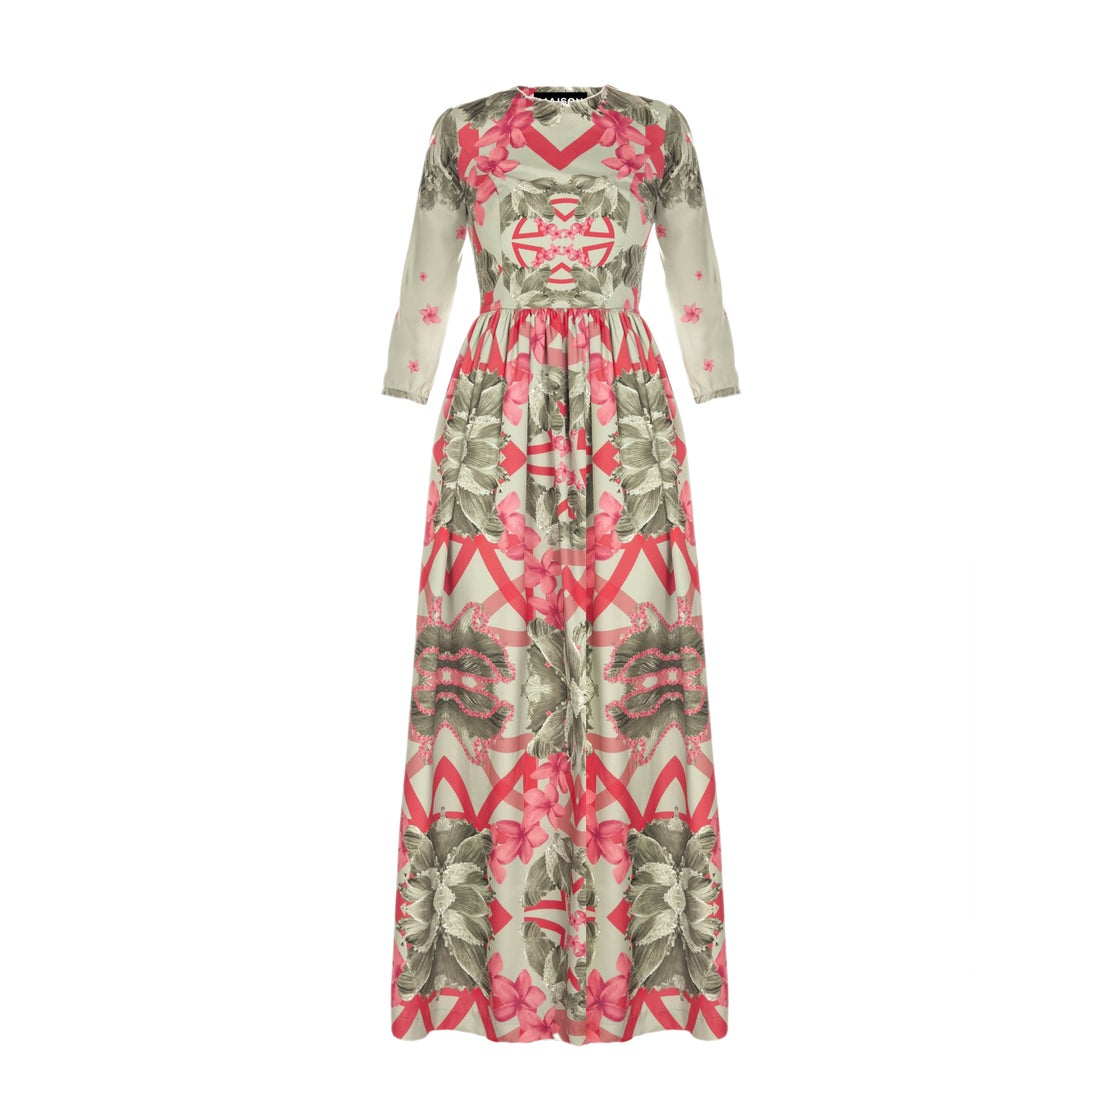 Image of Long Dress| Ariel Green